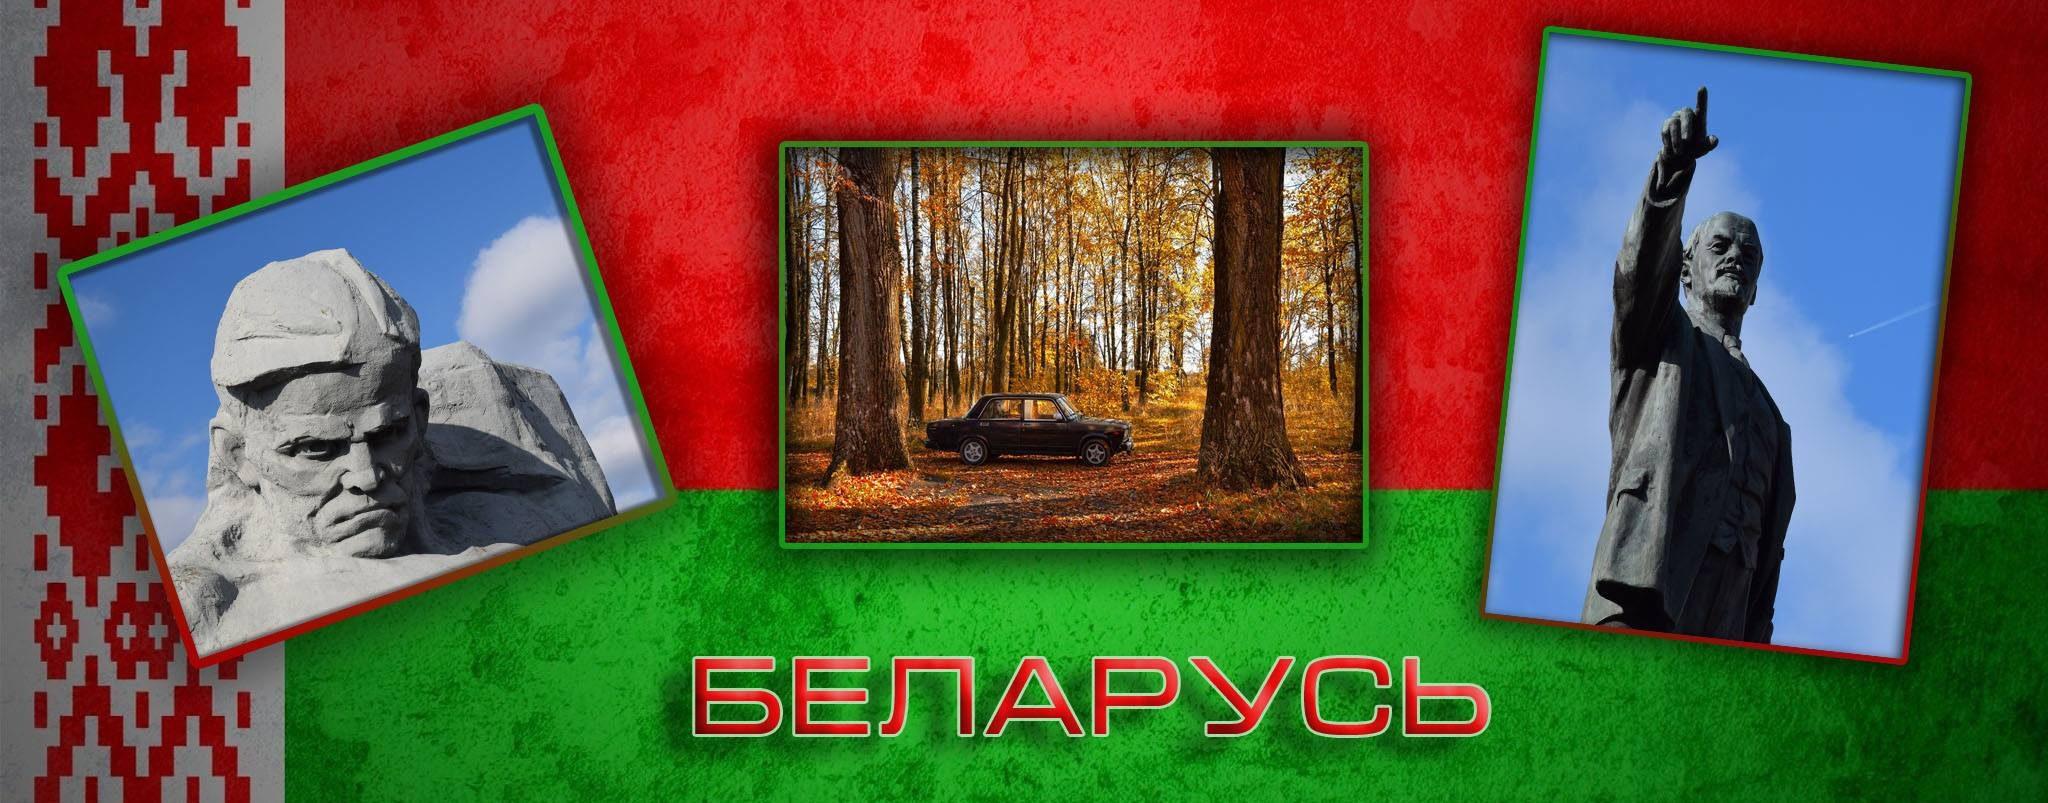 Białoruś – blisko, a tak daleko